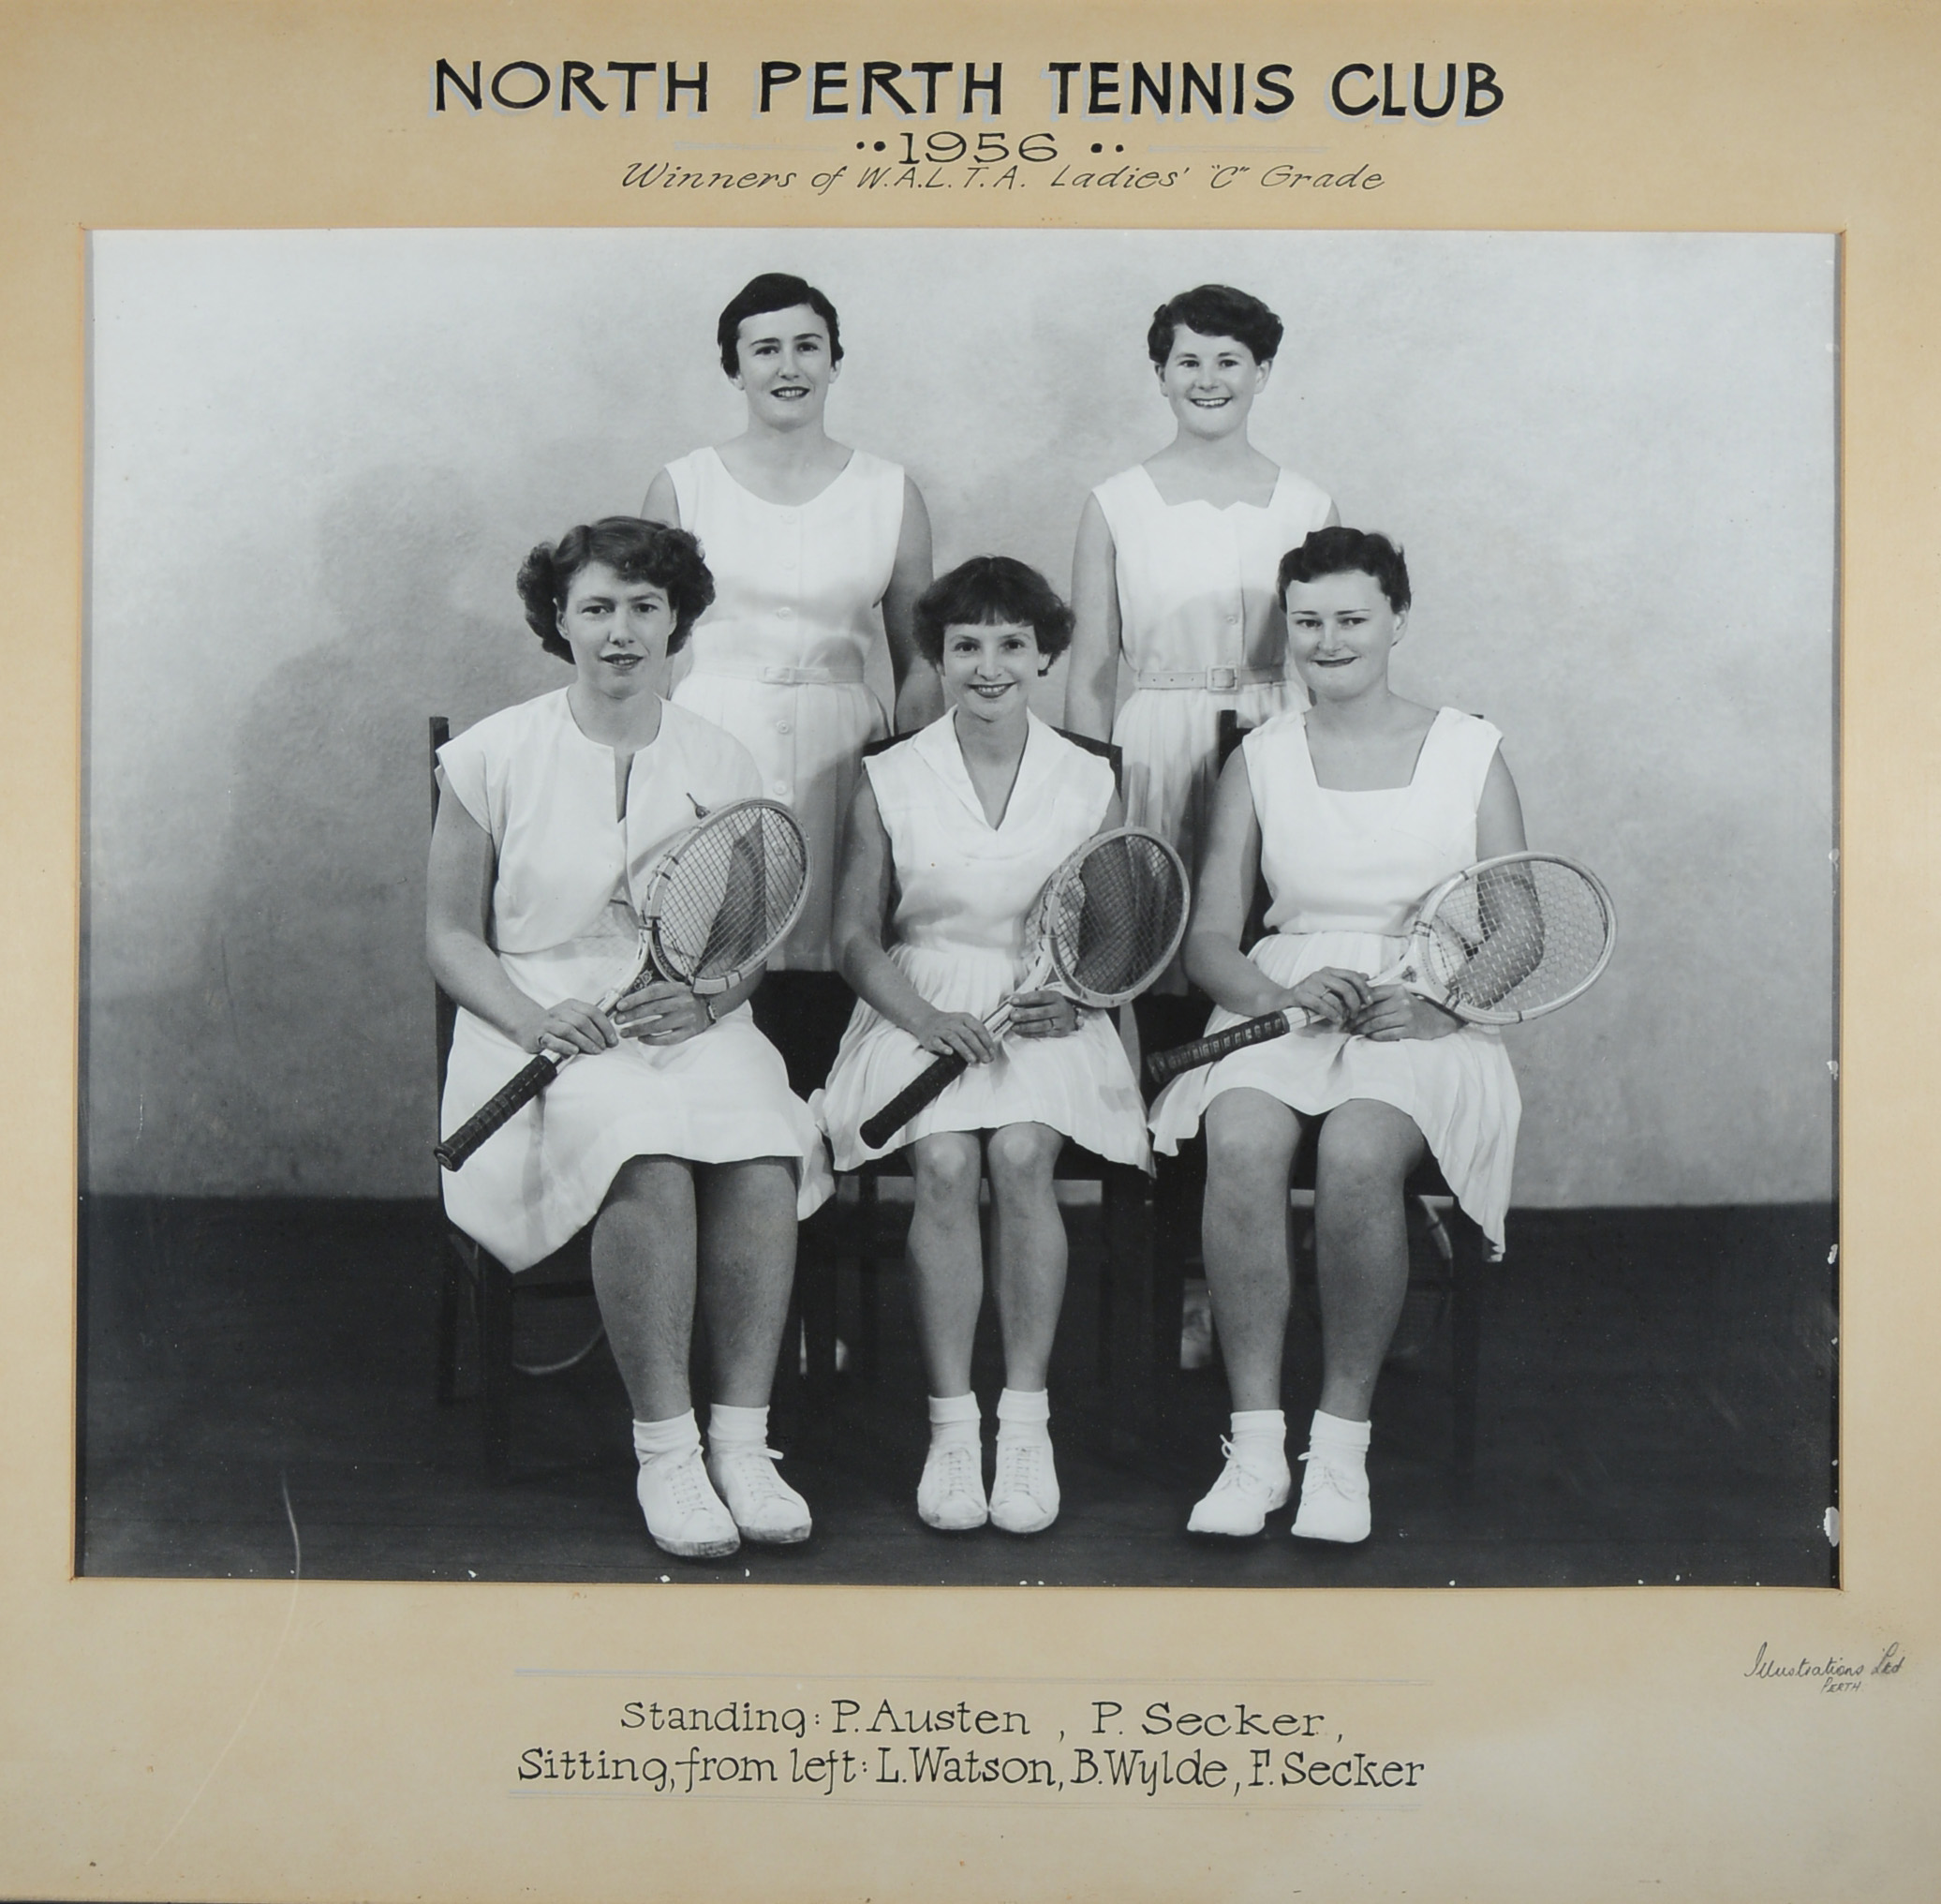 150. North Perth Tennis Club, 1956